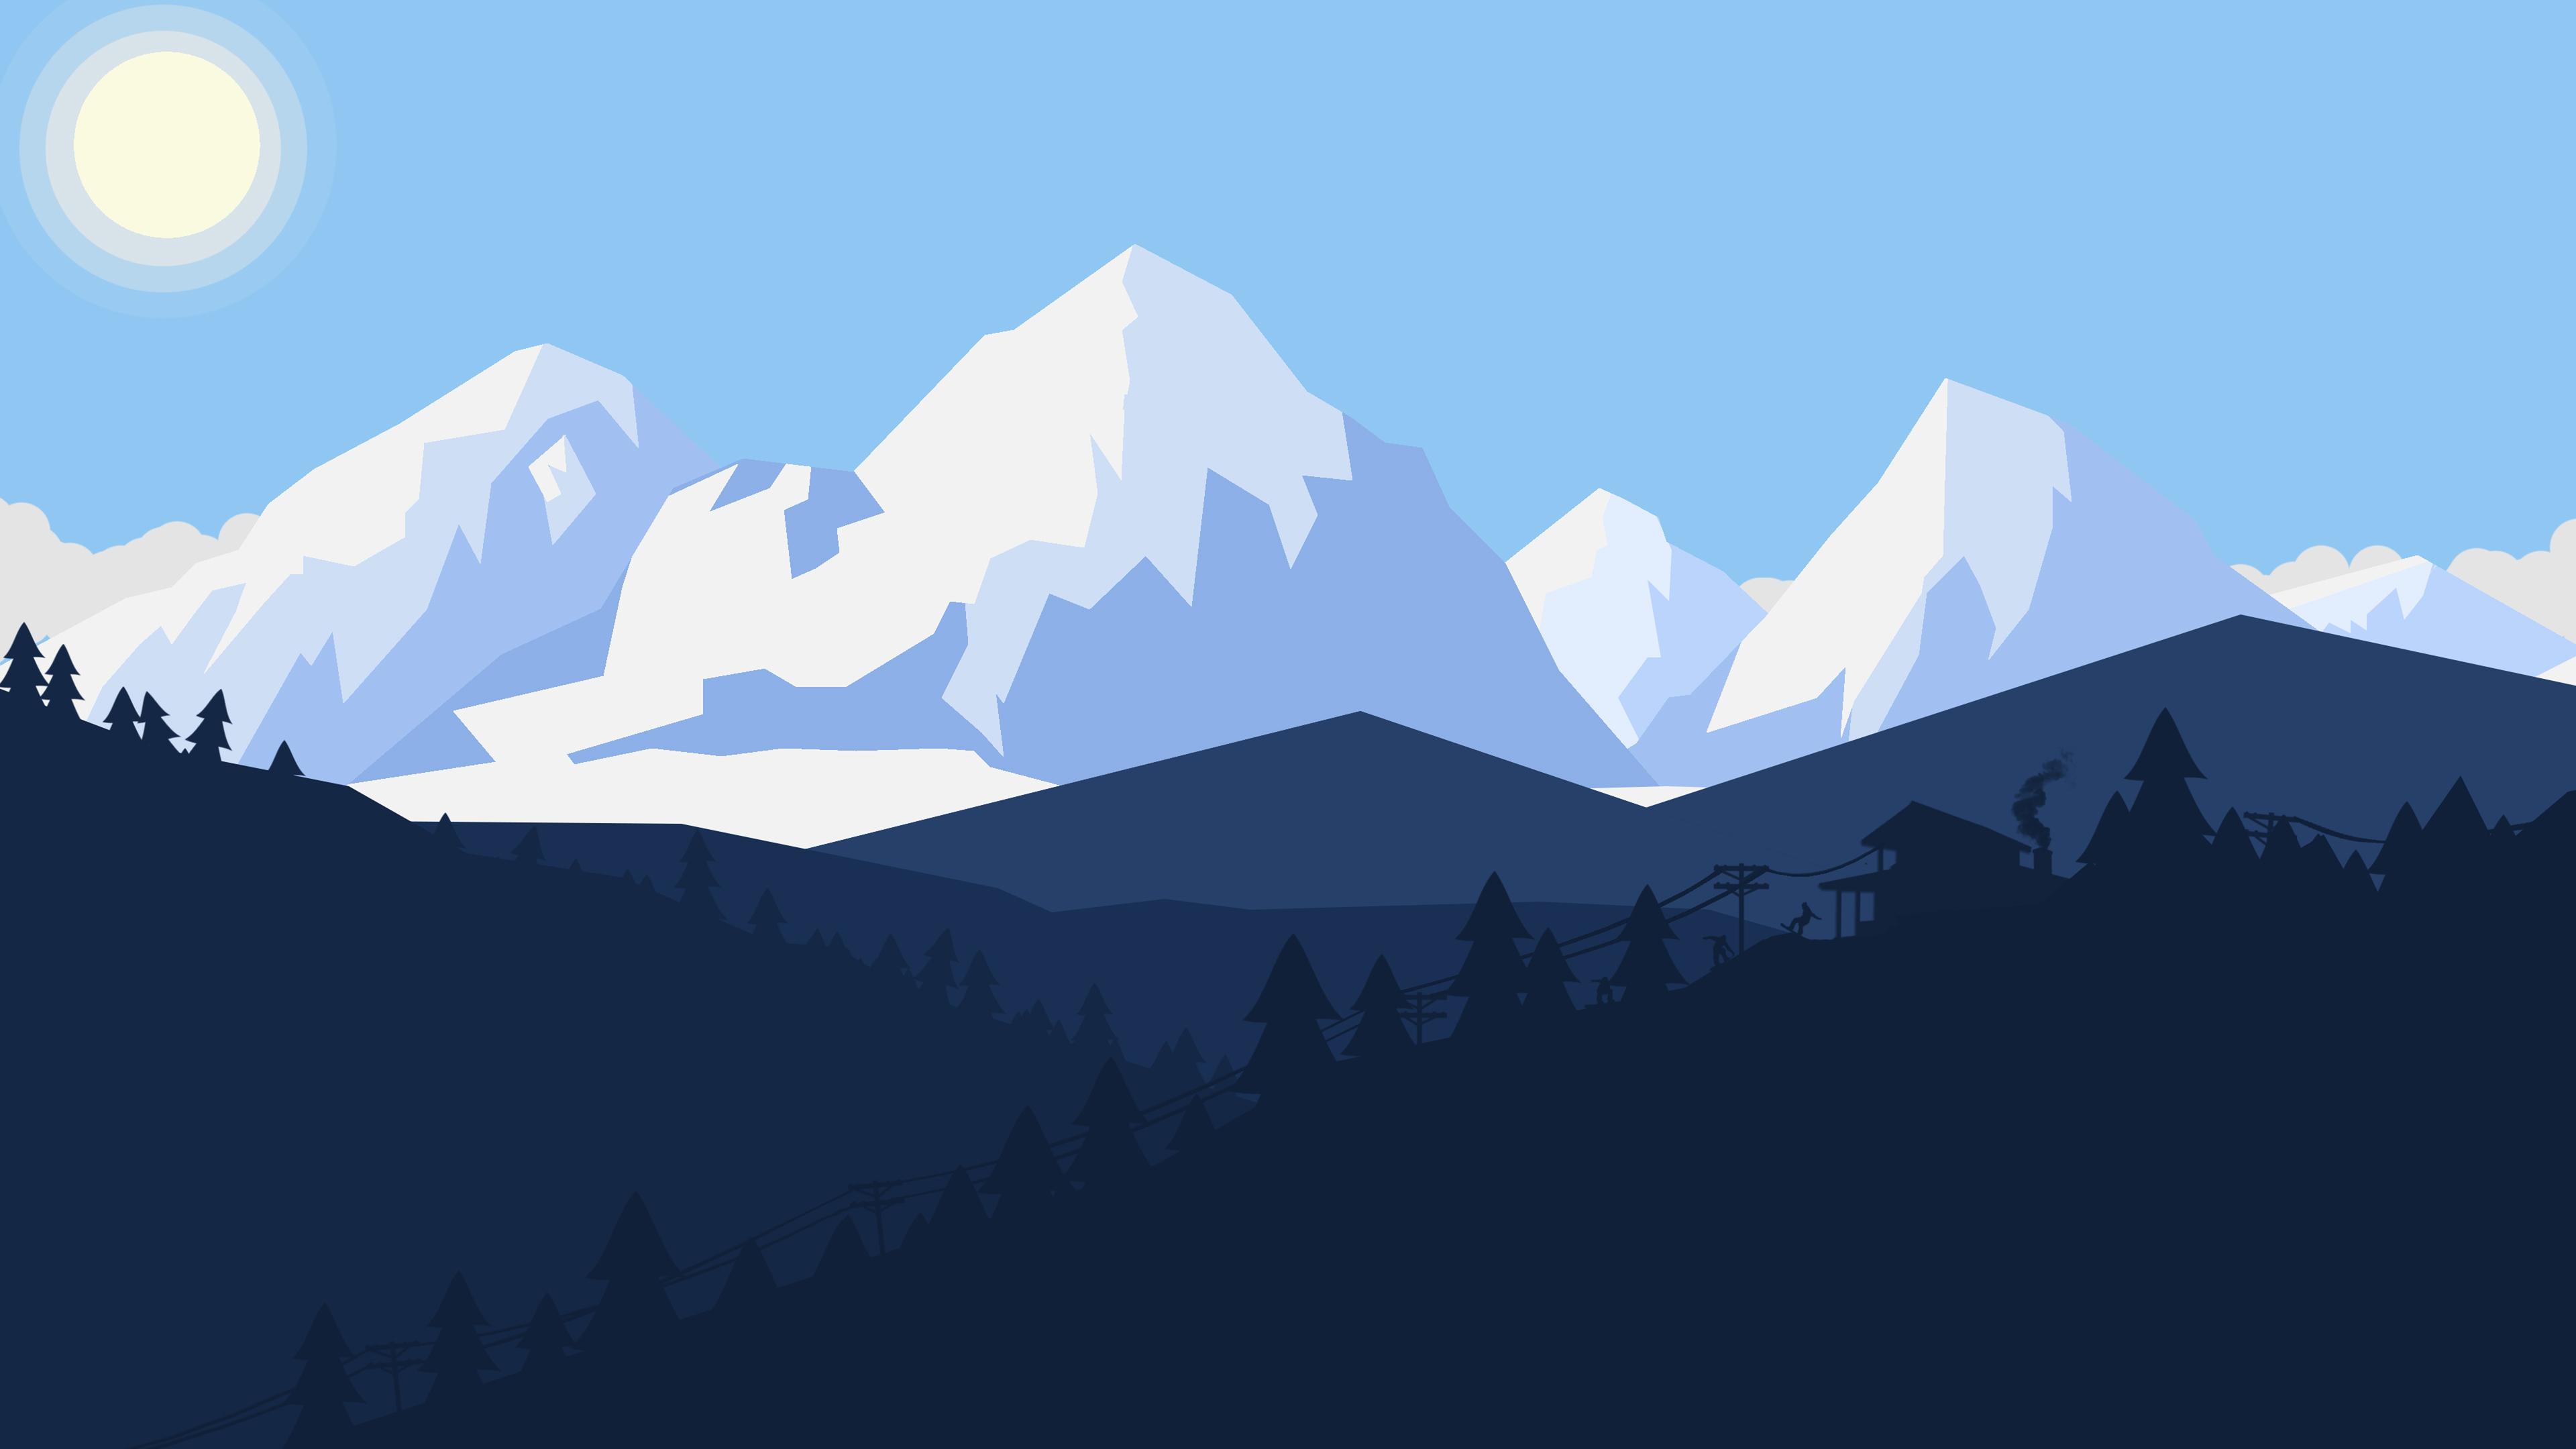 winter snow landscape minimalist 4k 1541970316 - Winter Snow Landscape Minimalist 4k - winter wallpapers, snow wallpapers, minimalist wallpapers, minimalism wallpapers, landscape wallpapers, hd-wallpapers, digital art wallpapers, deviantart wallpapers, artwork wallpapers, artist wallpapers, 4k-wallpapers